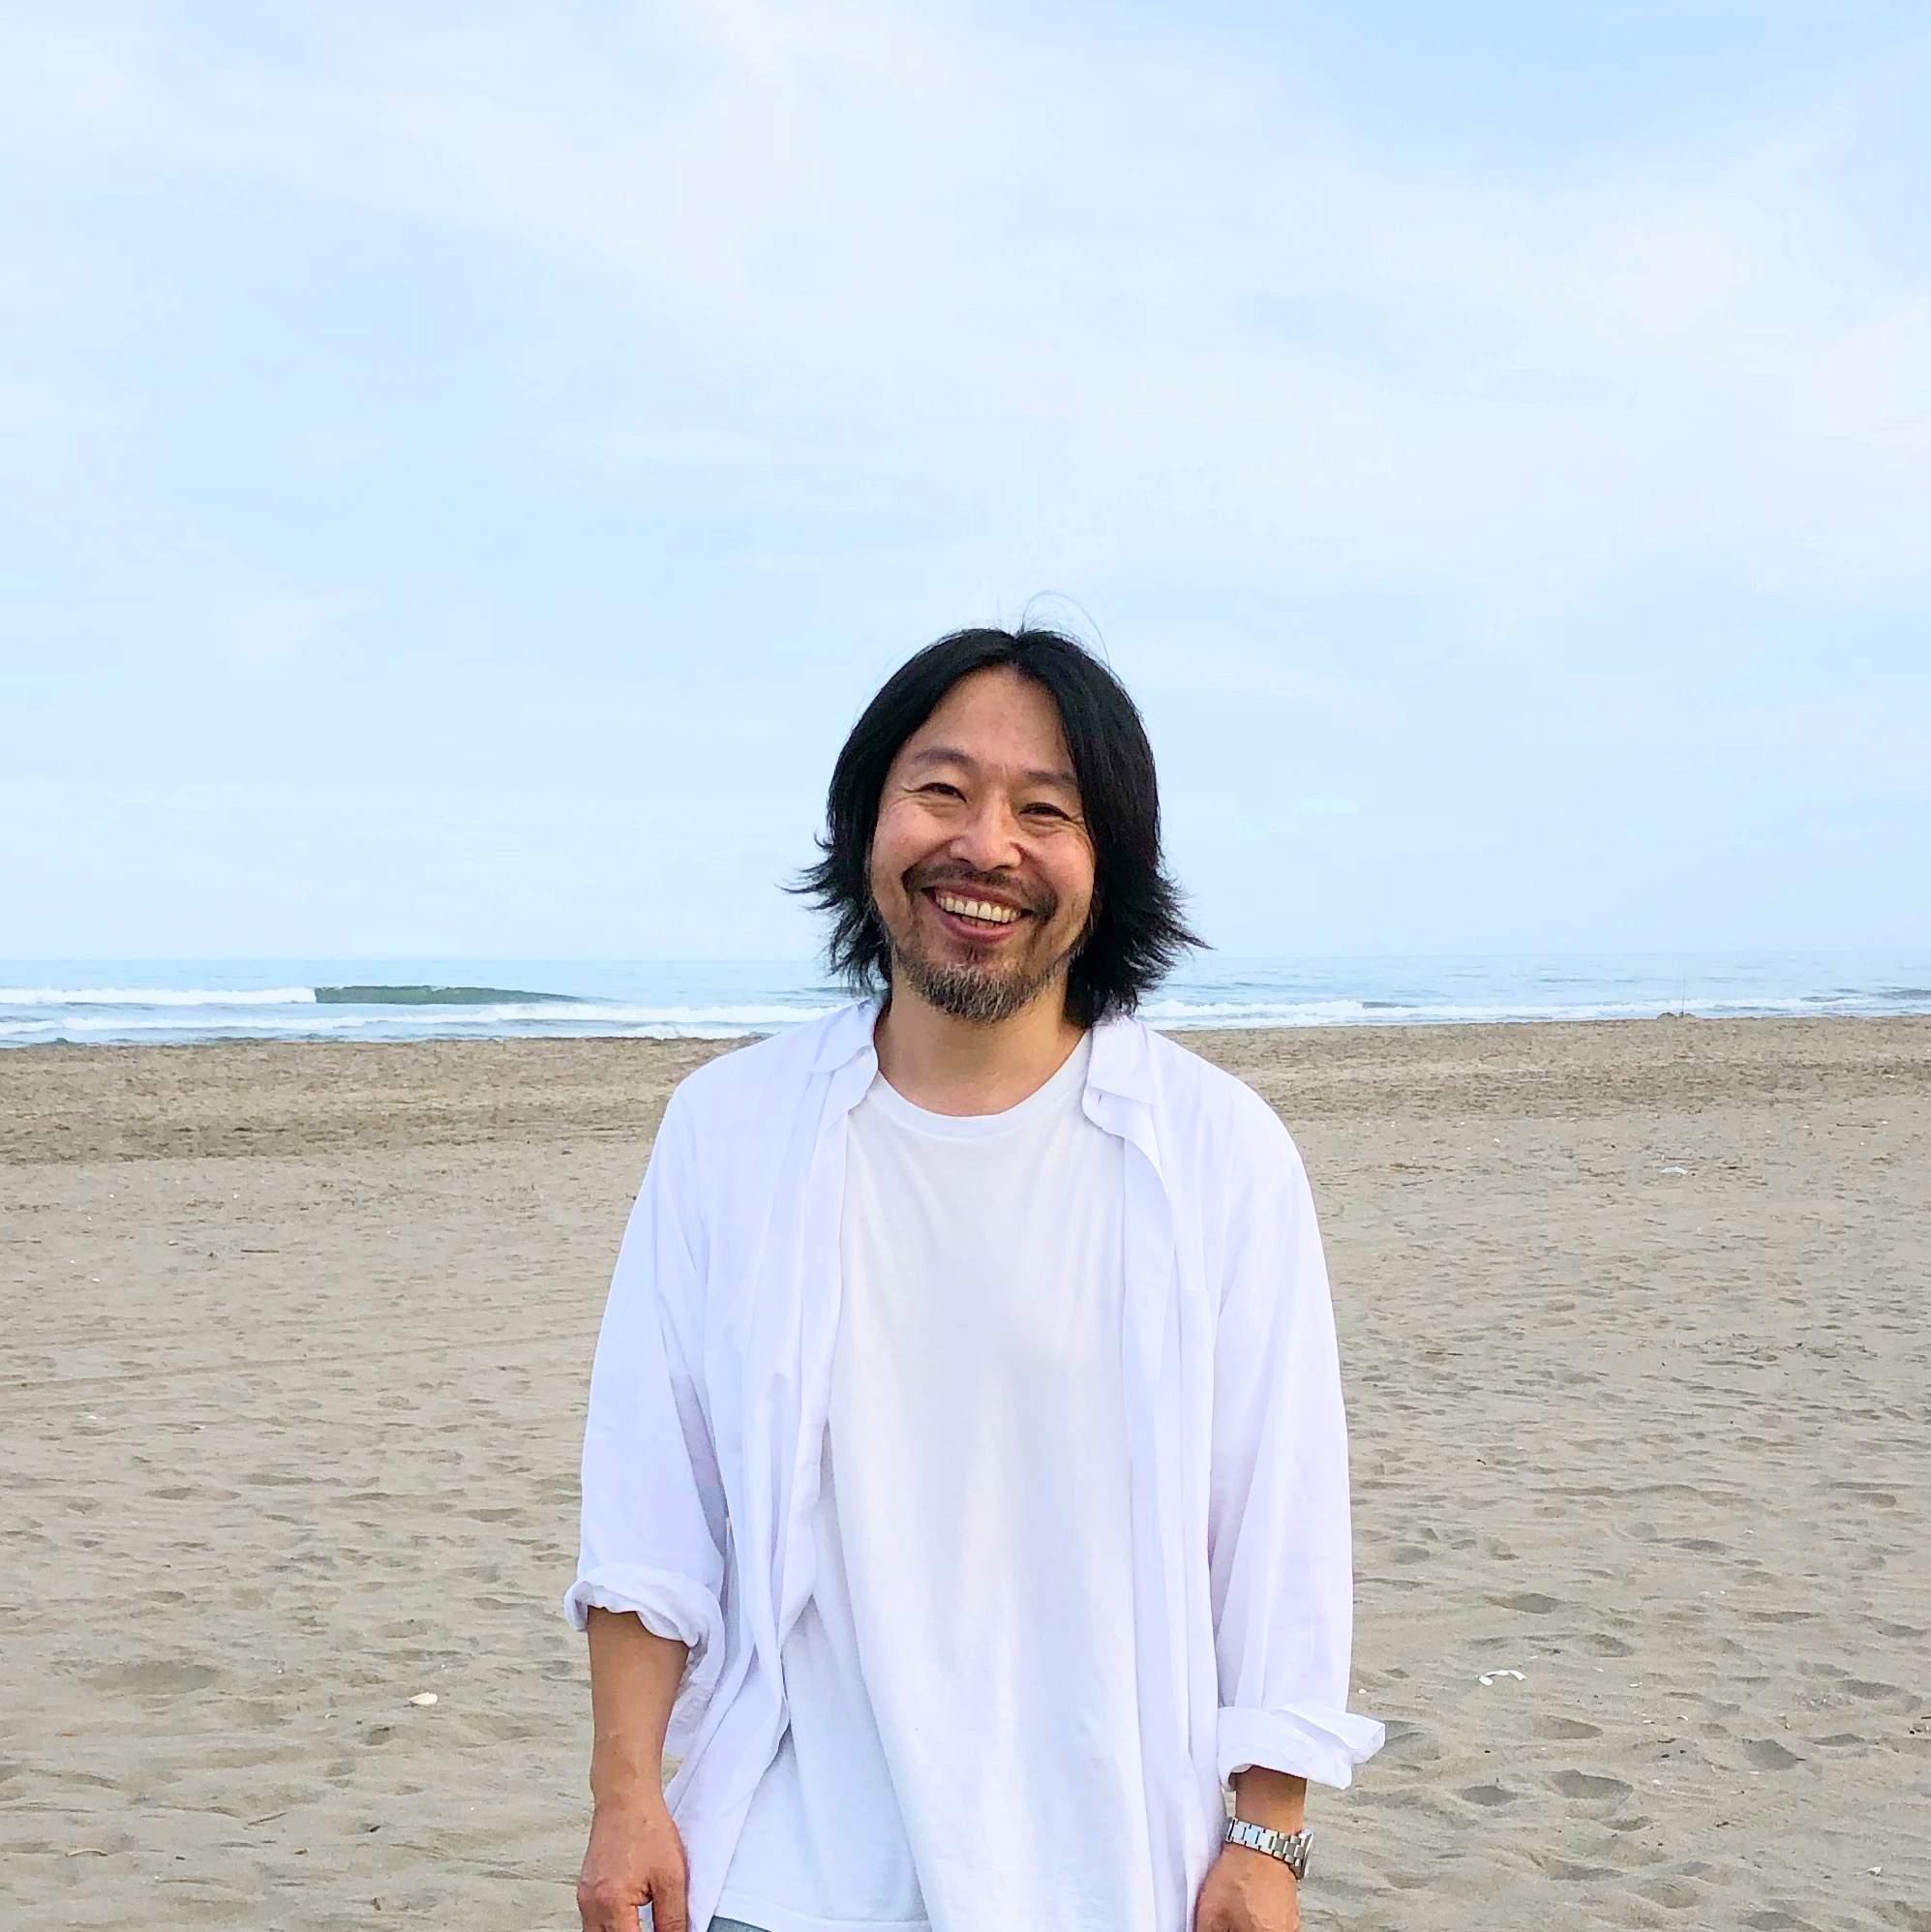 http://rose-records.jp/files/20200813115827.jpg